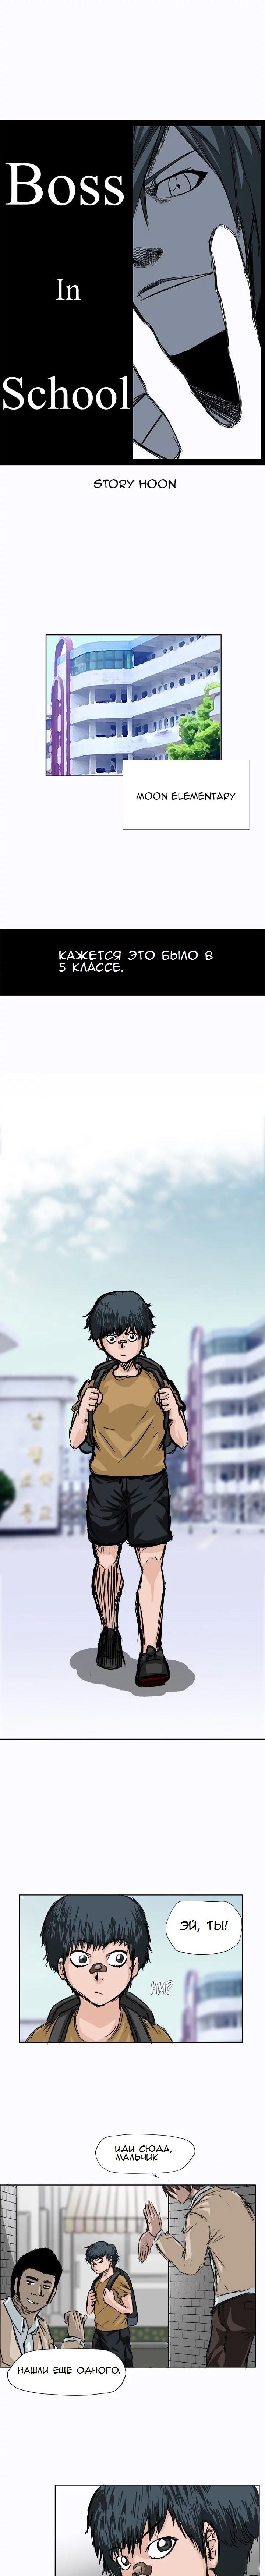 https://r2.ninemanga.com/comics/pic4/61/37949/1350030/1559195870896.jpg Page 5